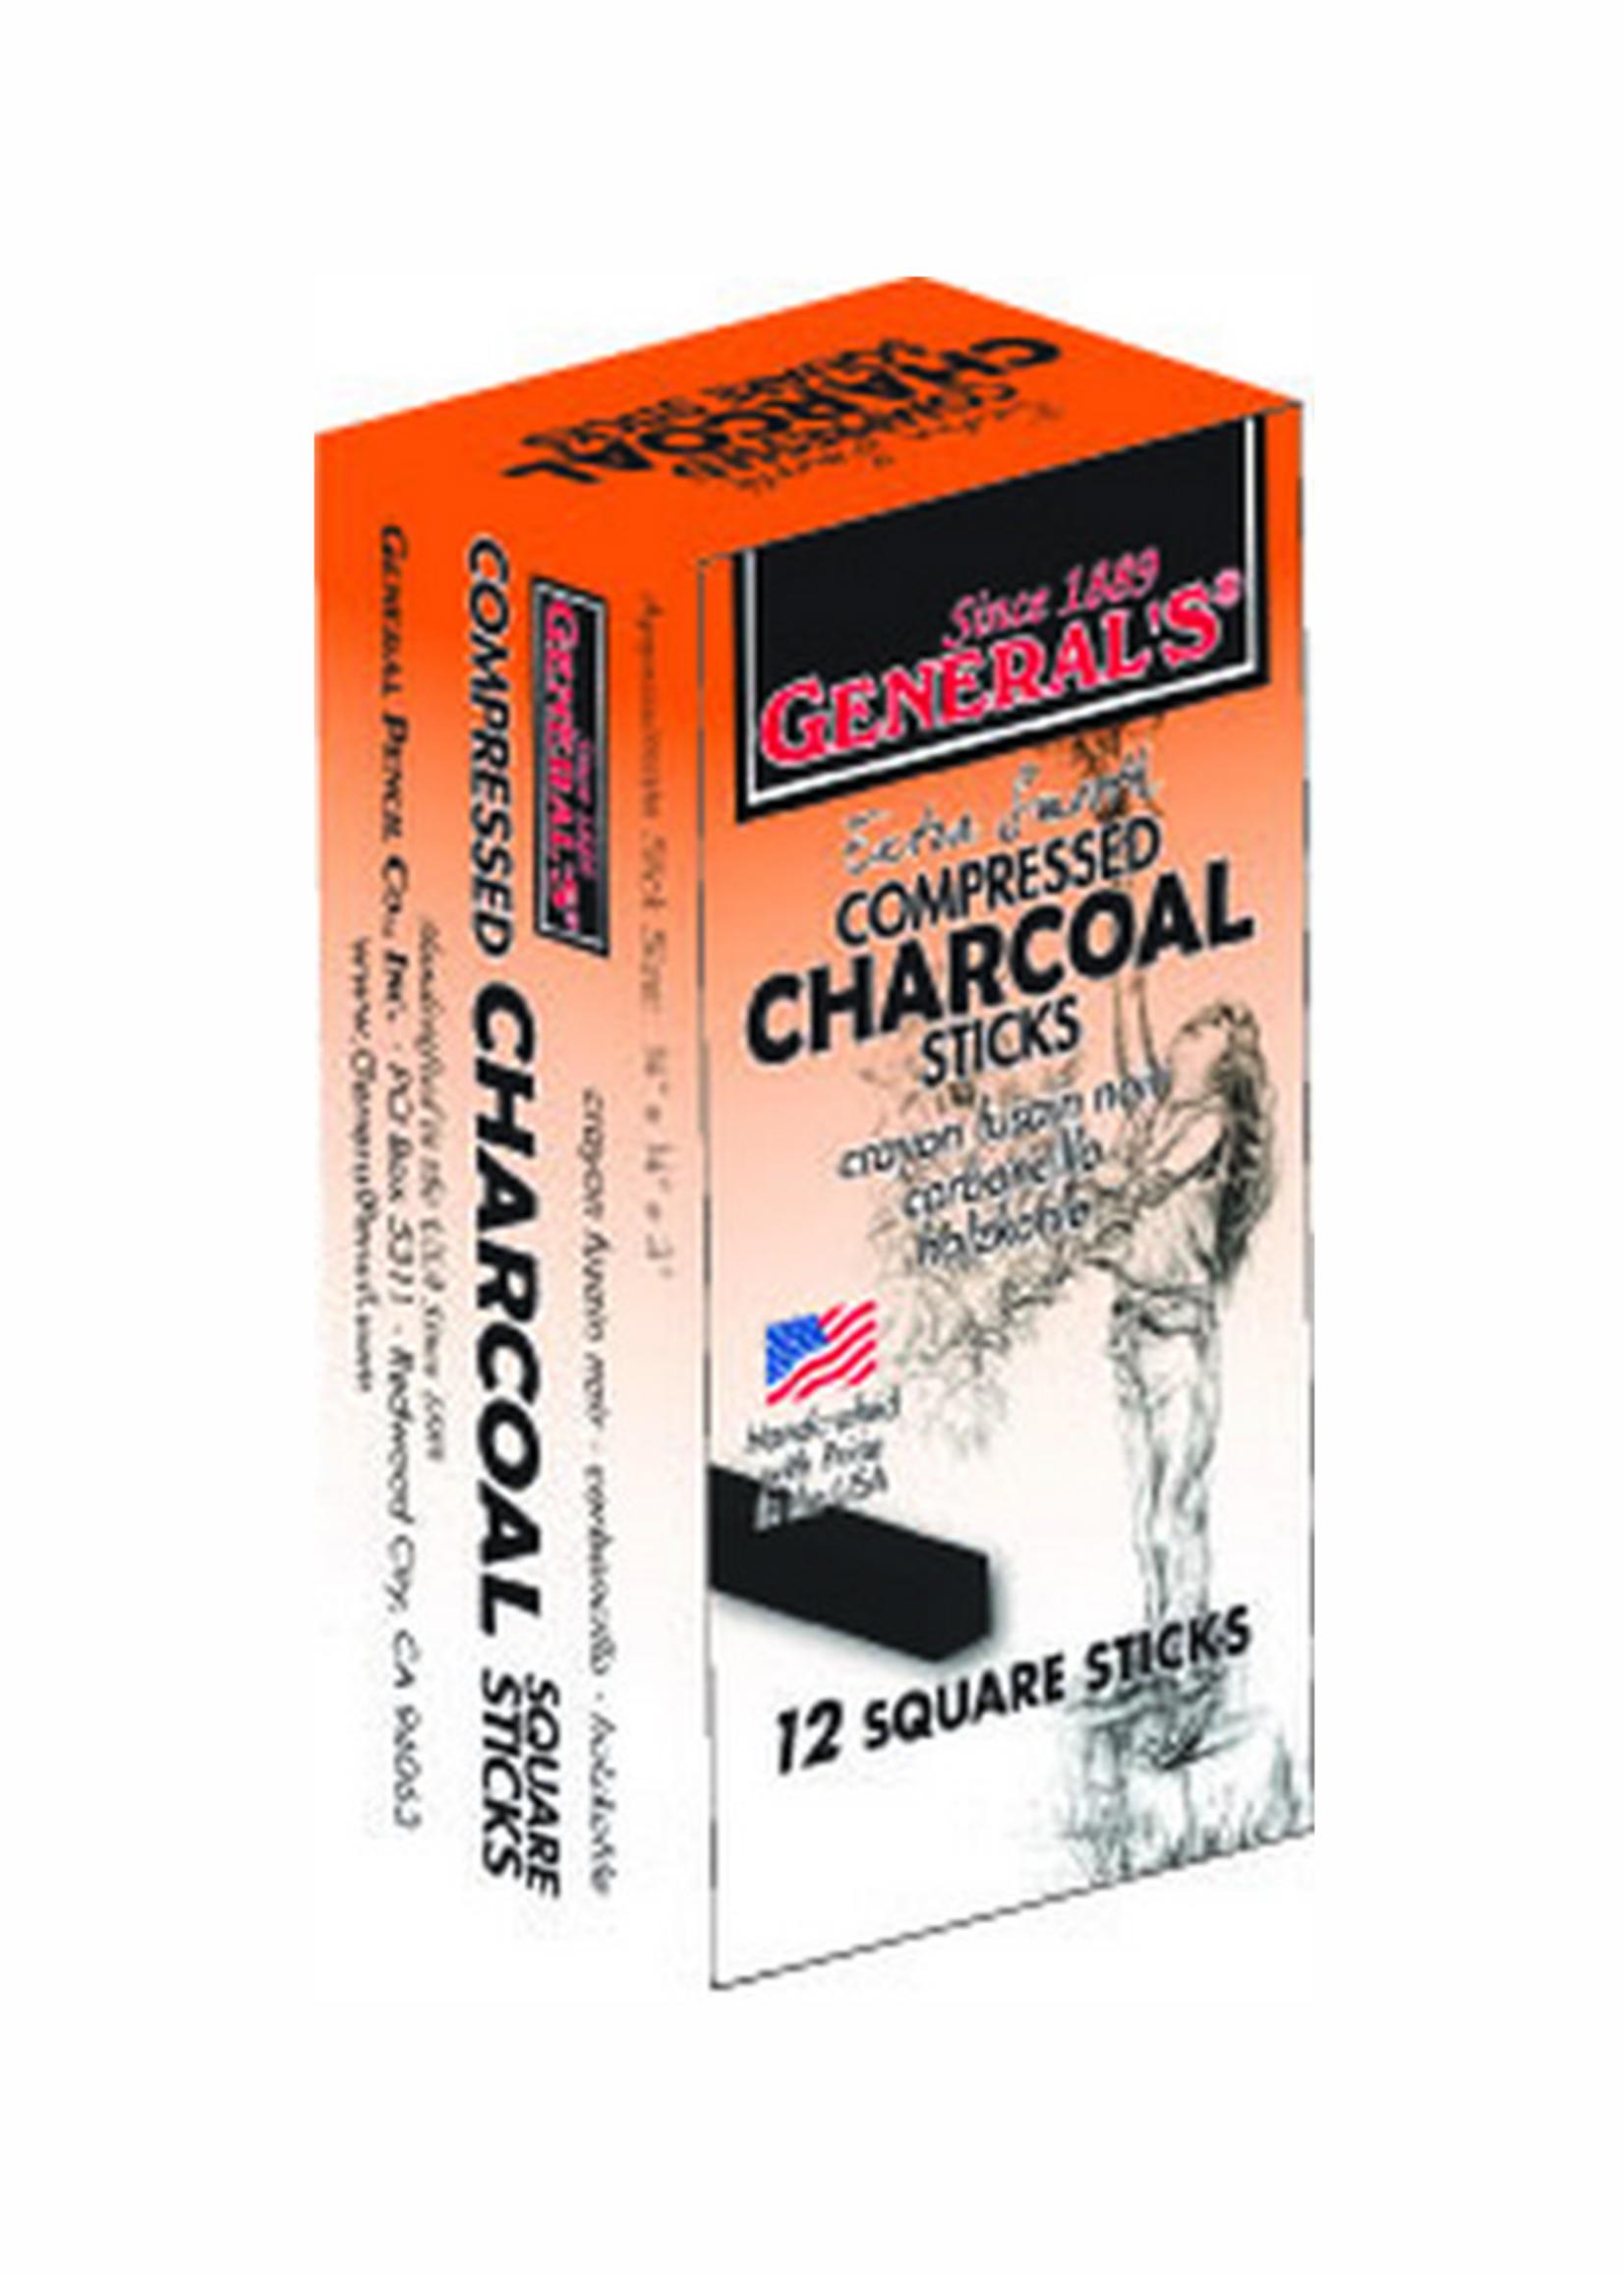 GENERAL PENCIL CO., INC. 2B MEDIUM COMPRESSED CHARCOAL STICKS 12/BOX